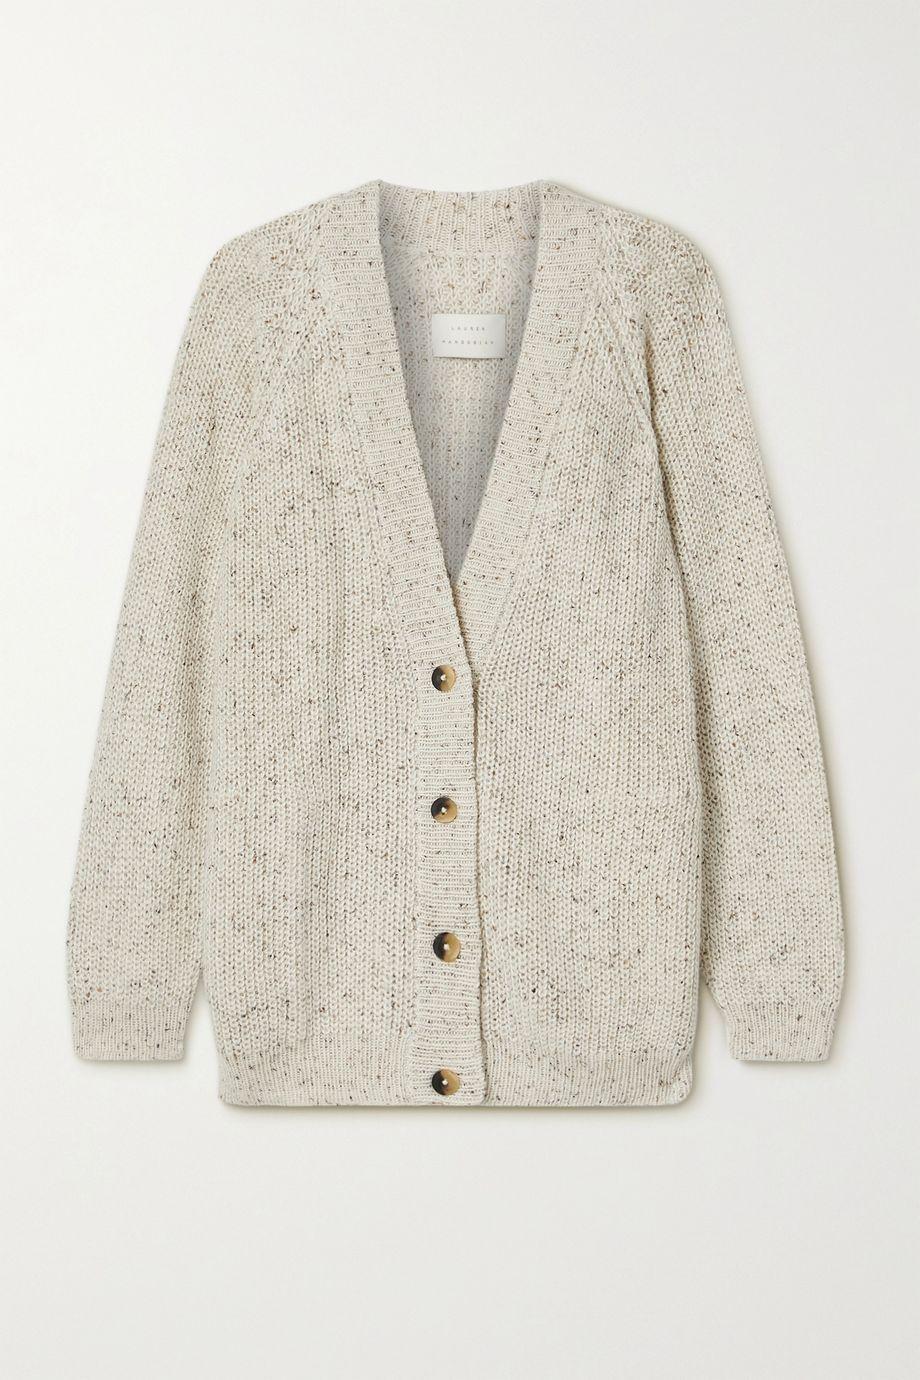 Lauren Manoogian Shaker knitted cardigan